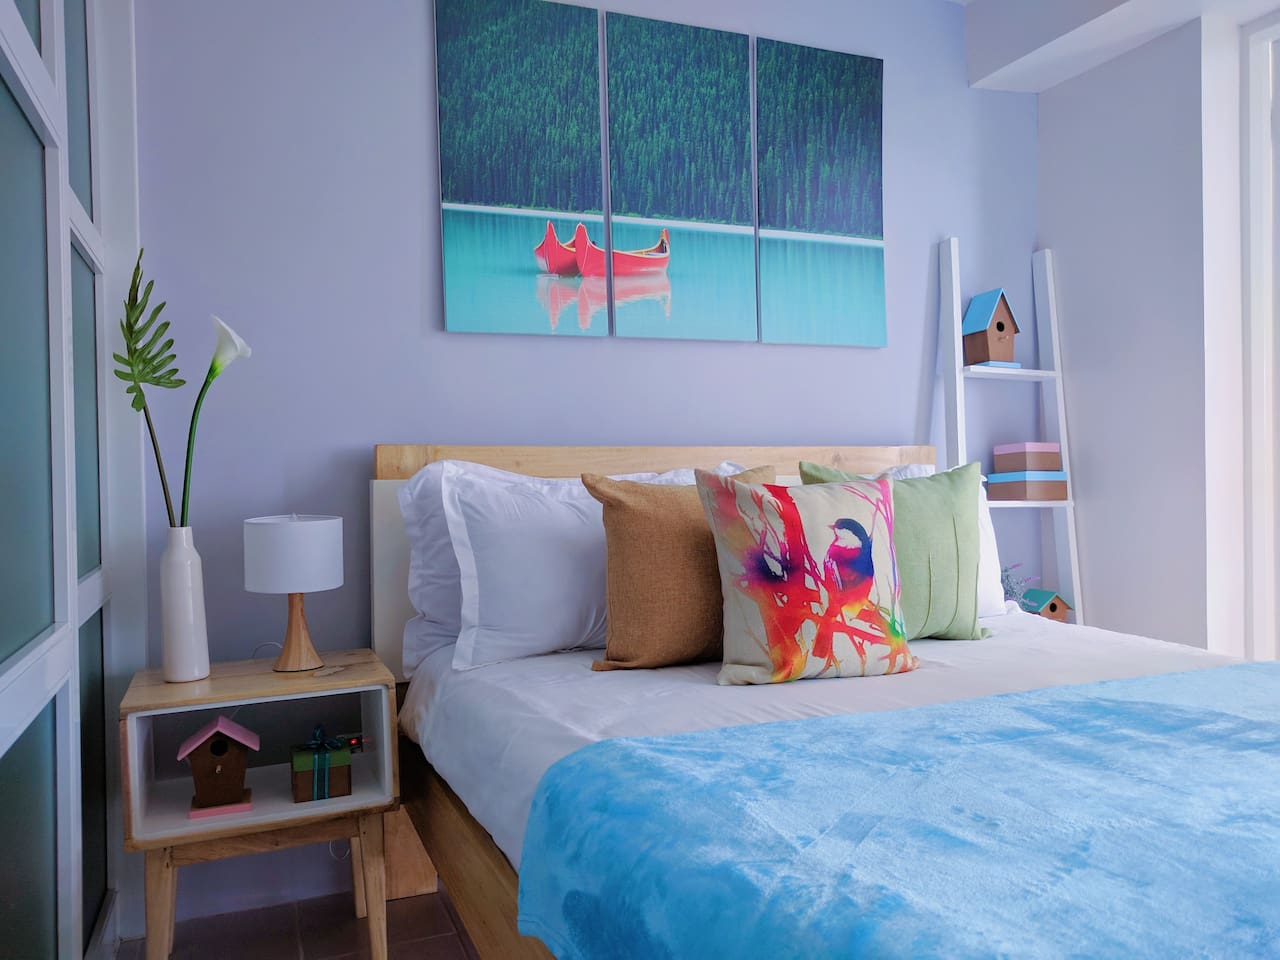 Canopy Tagaytay Bedroom Set-up & Interior